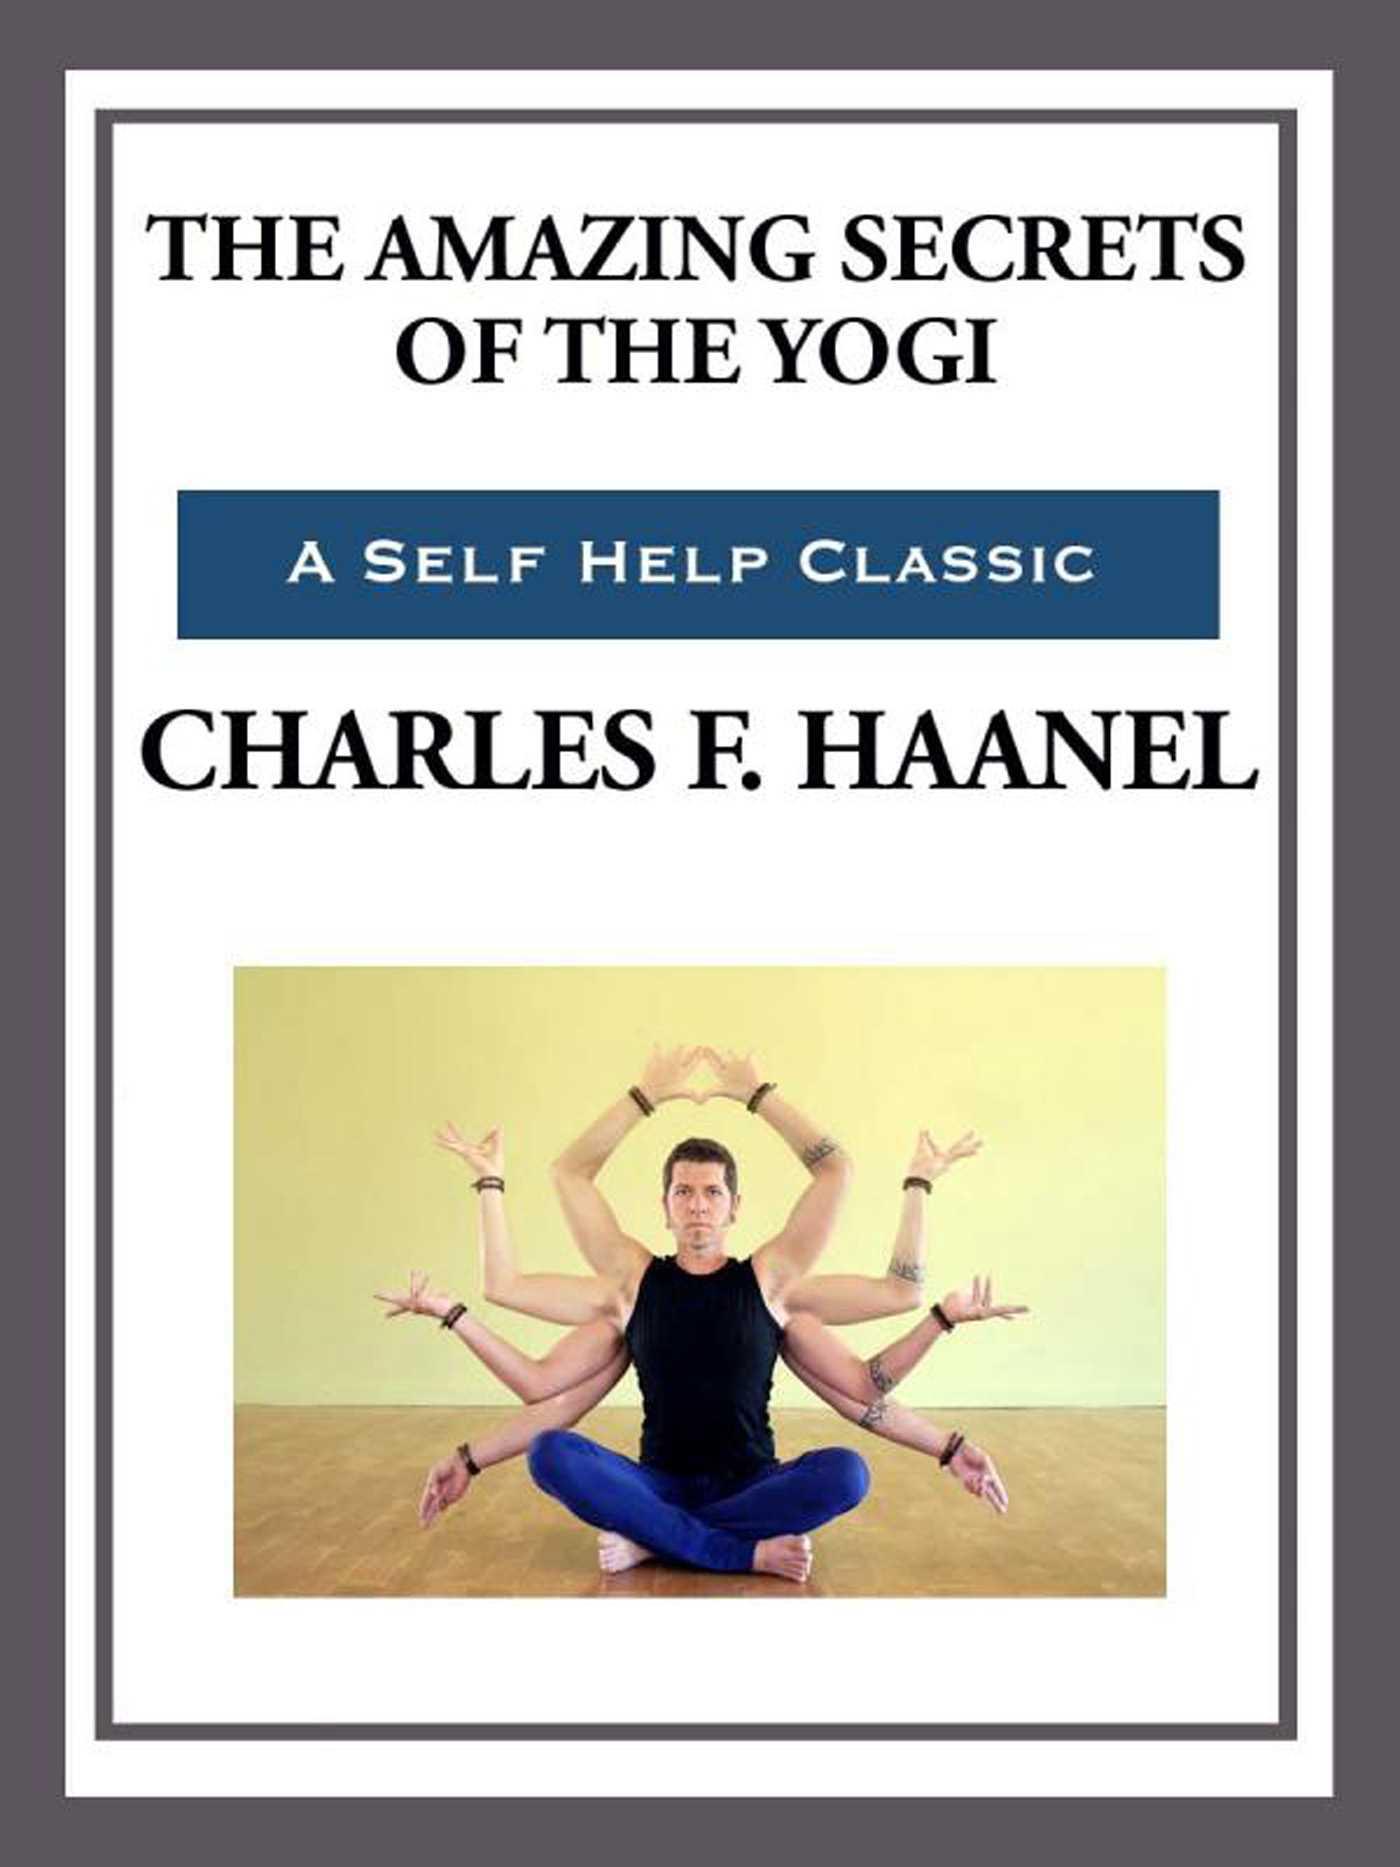 Book Cover Image (jpg): The Amazing Secrets of the Yogi